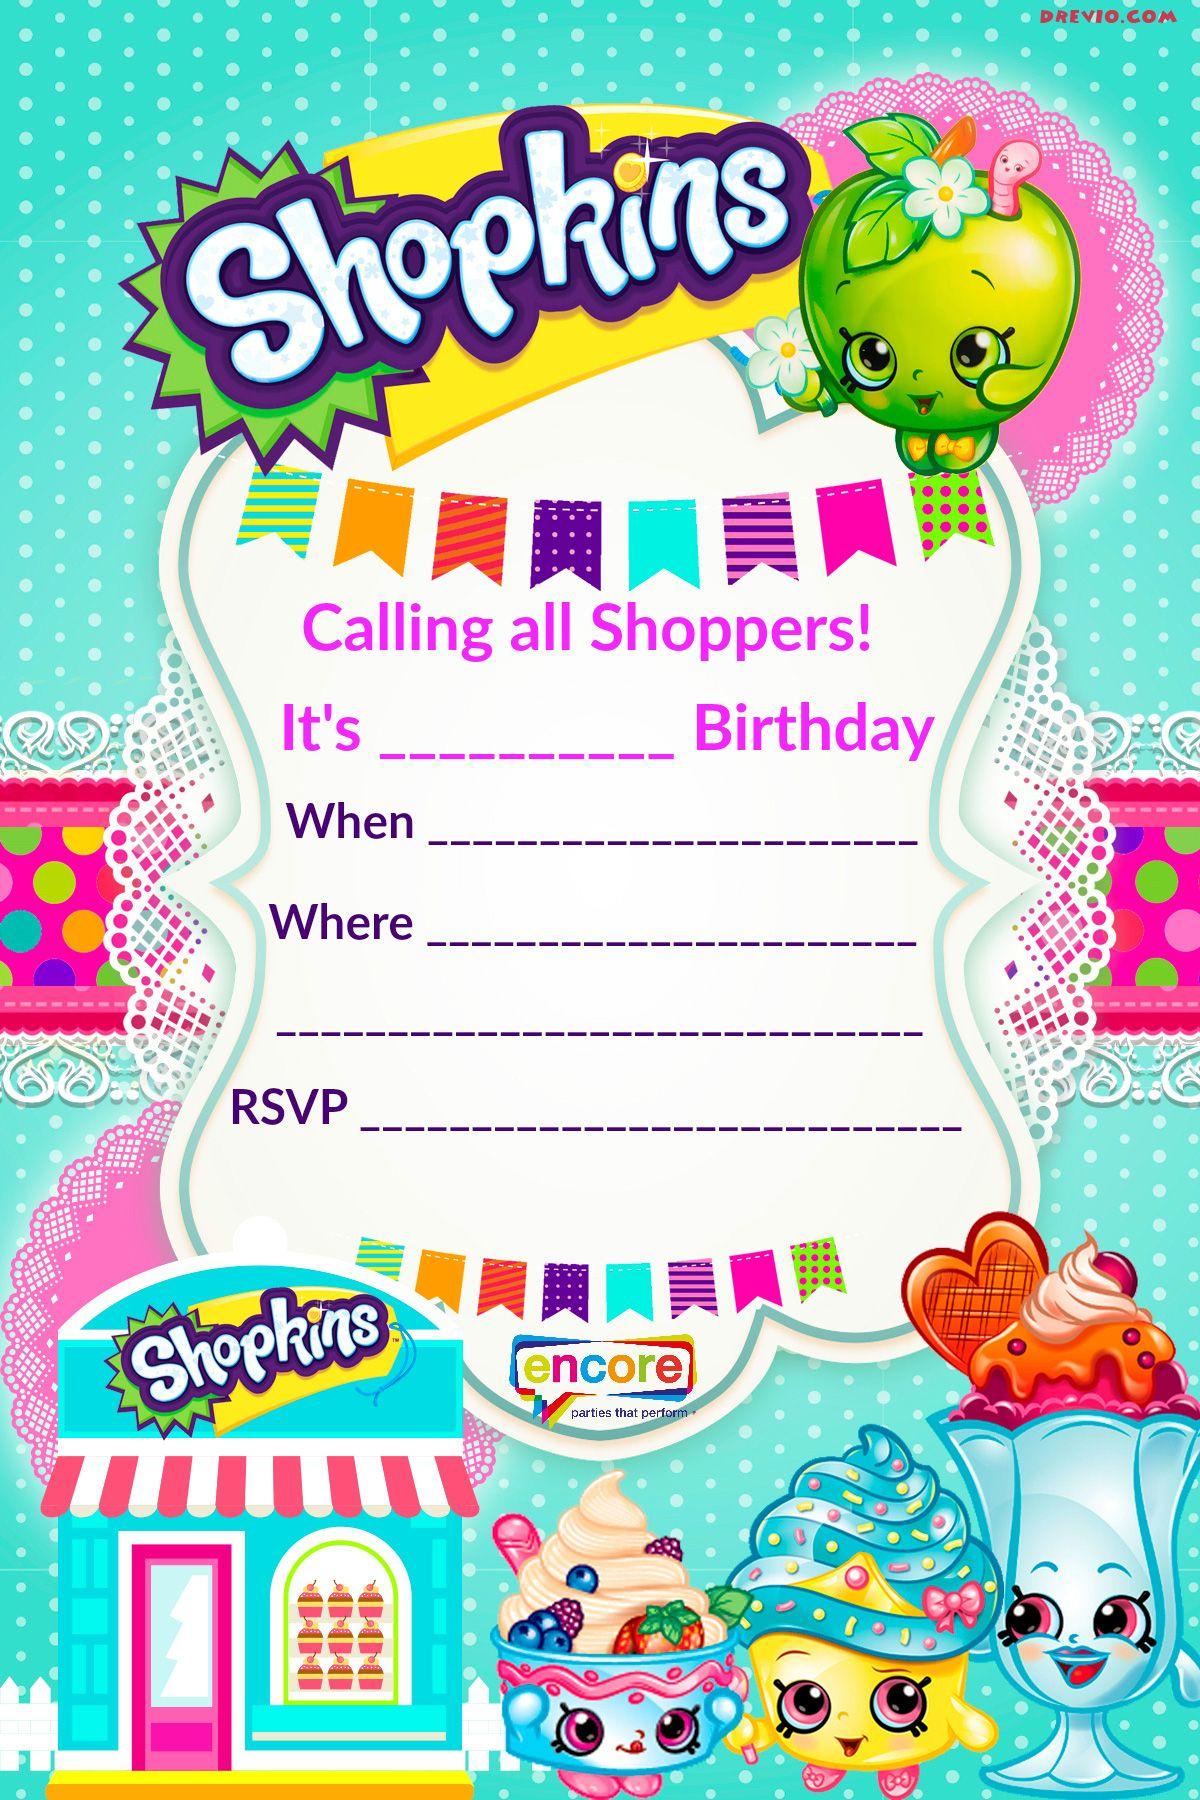 Updated - Free Printable Shopkins Birthday Invitation   Free - Free Printable Shopkins Invitations